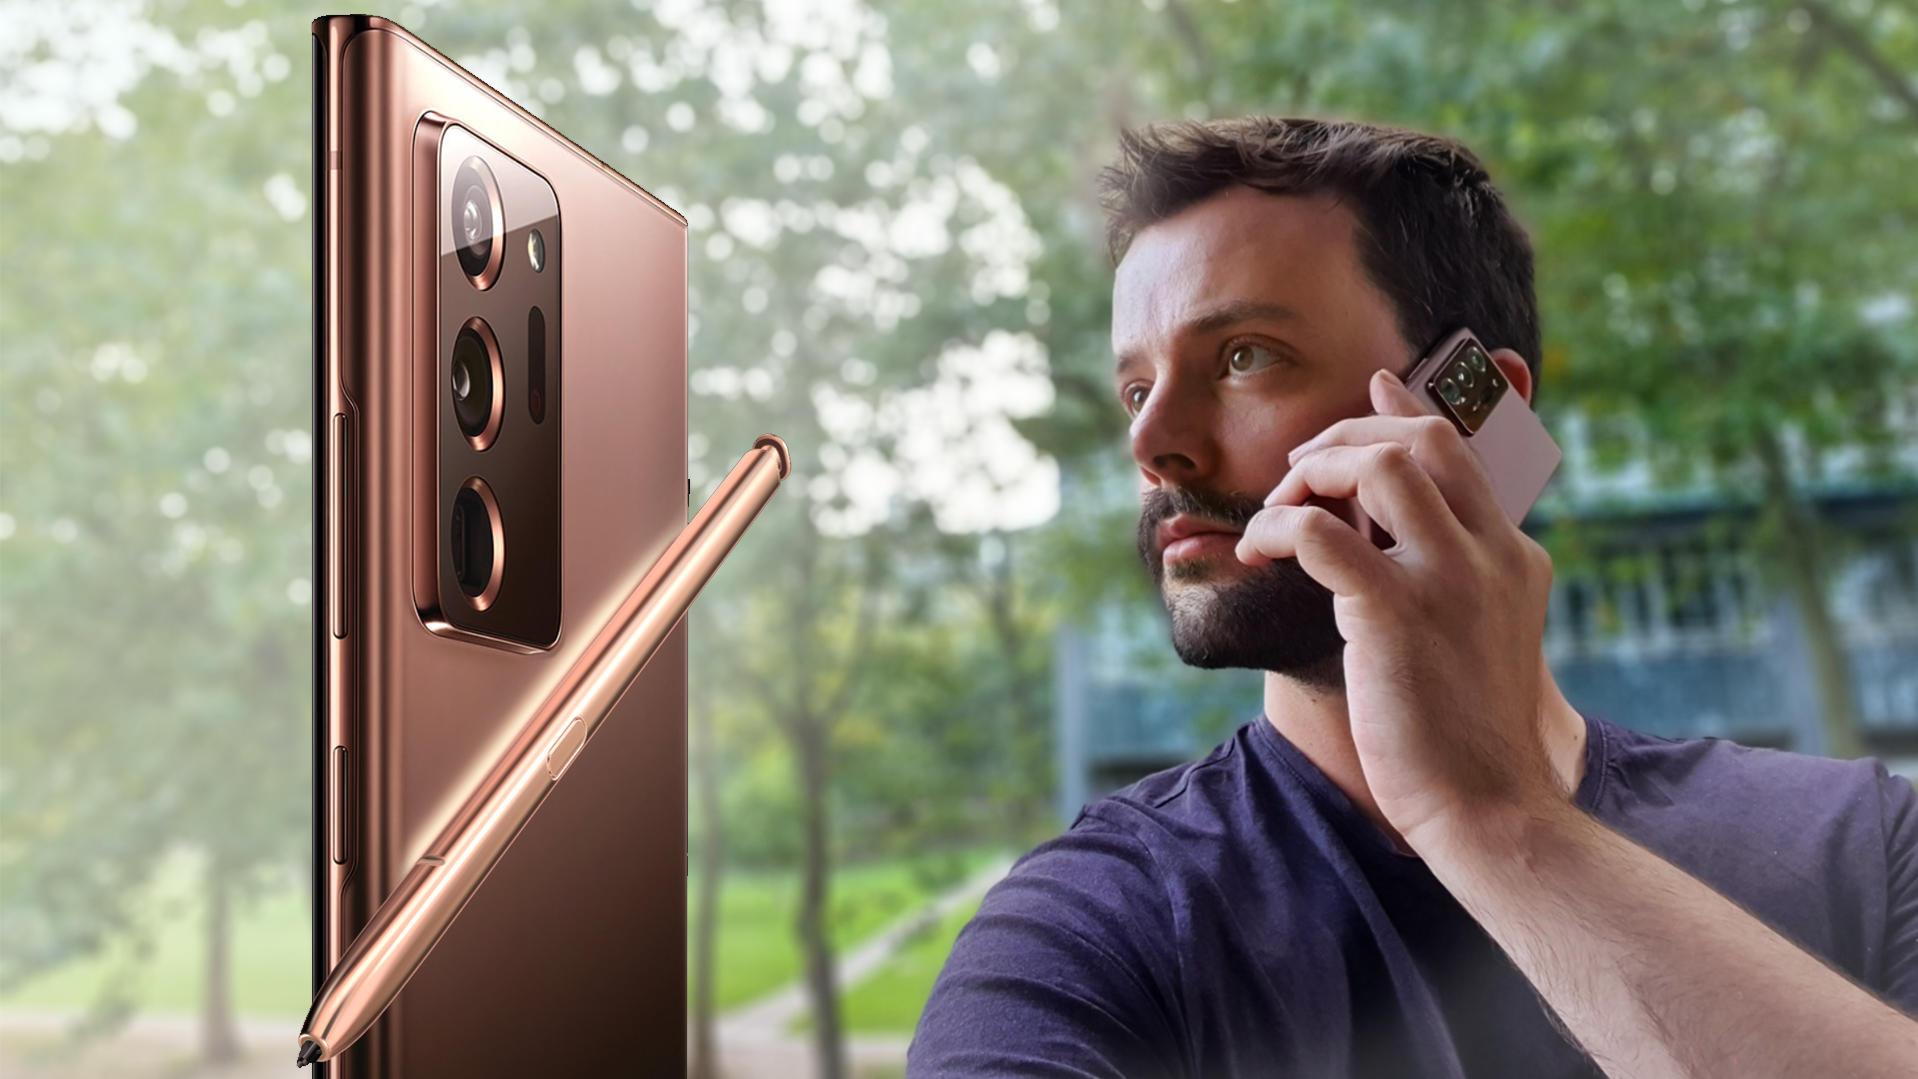 Samsung Galaxy Note 20 Ultra: Test im Alltag